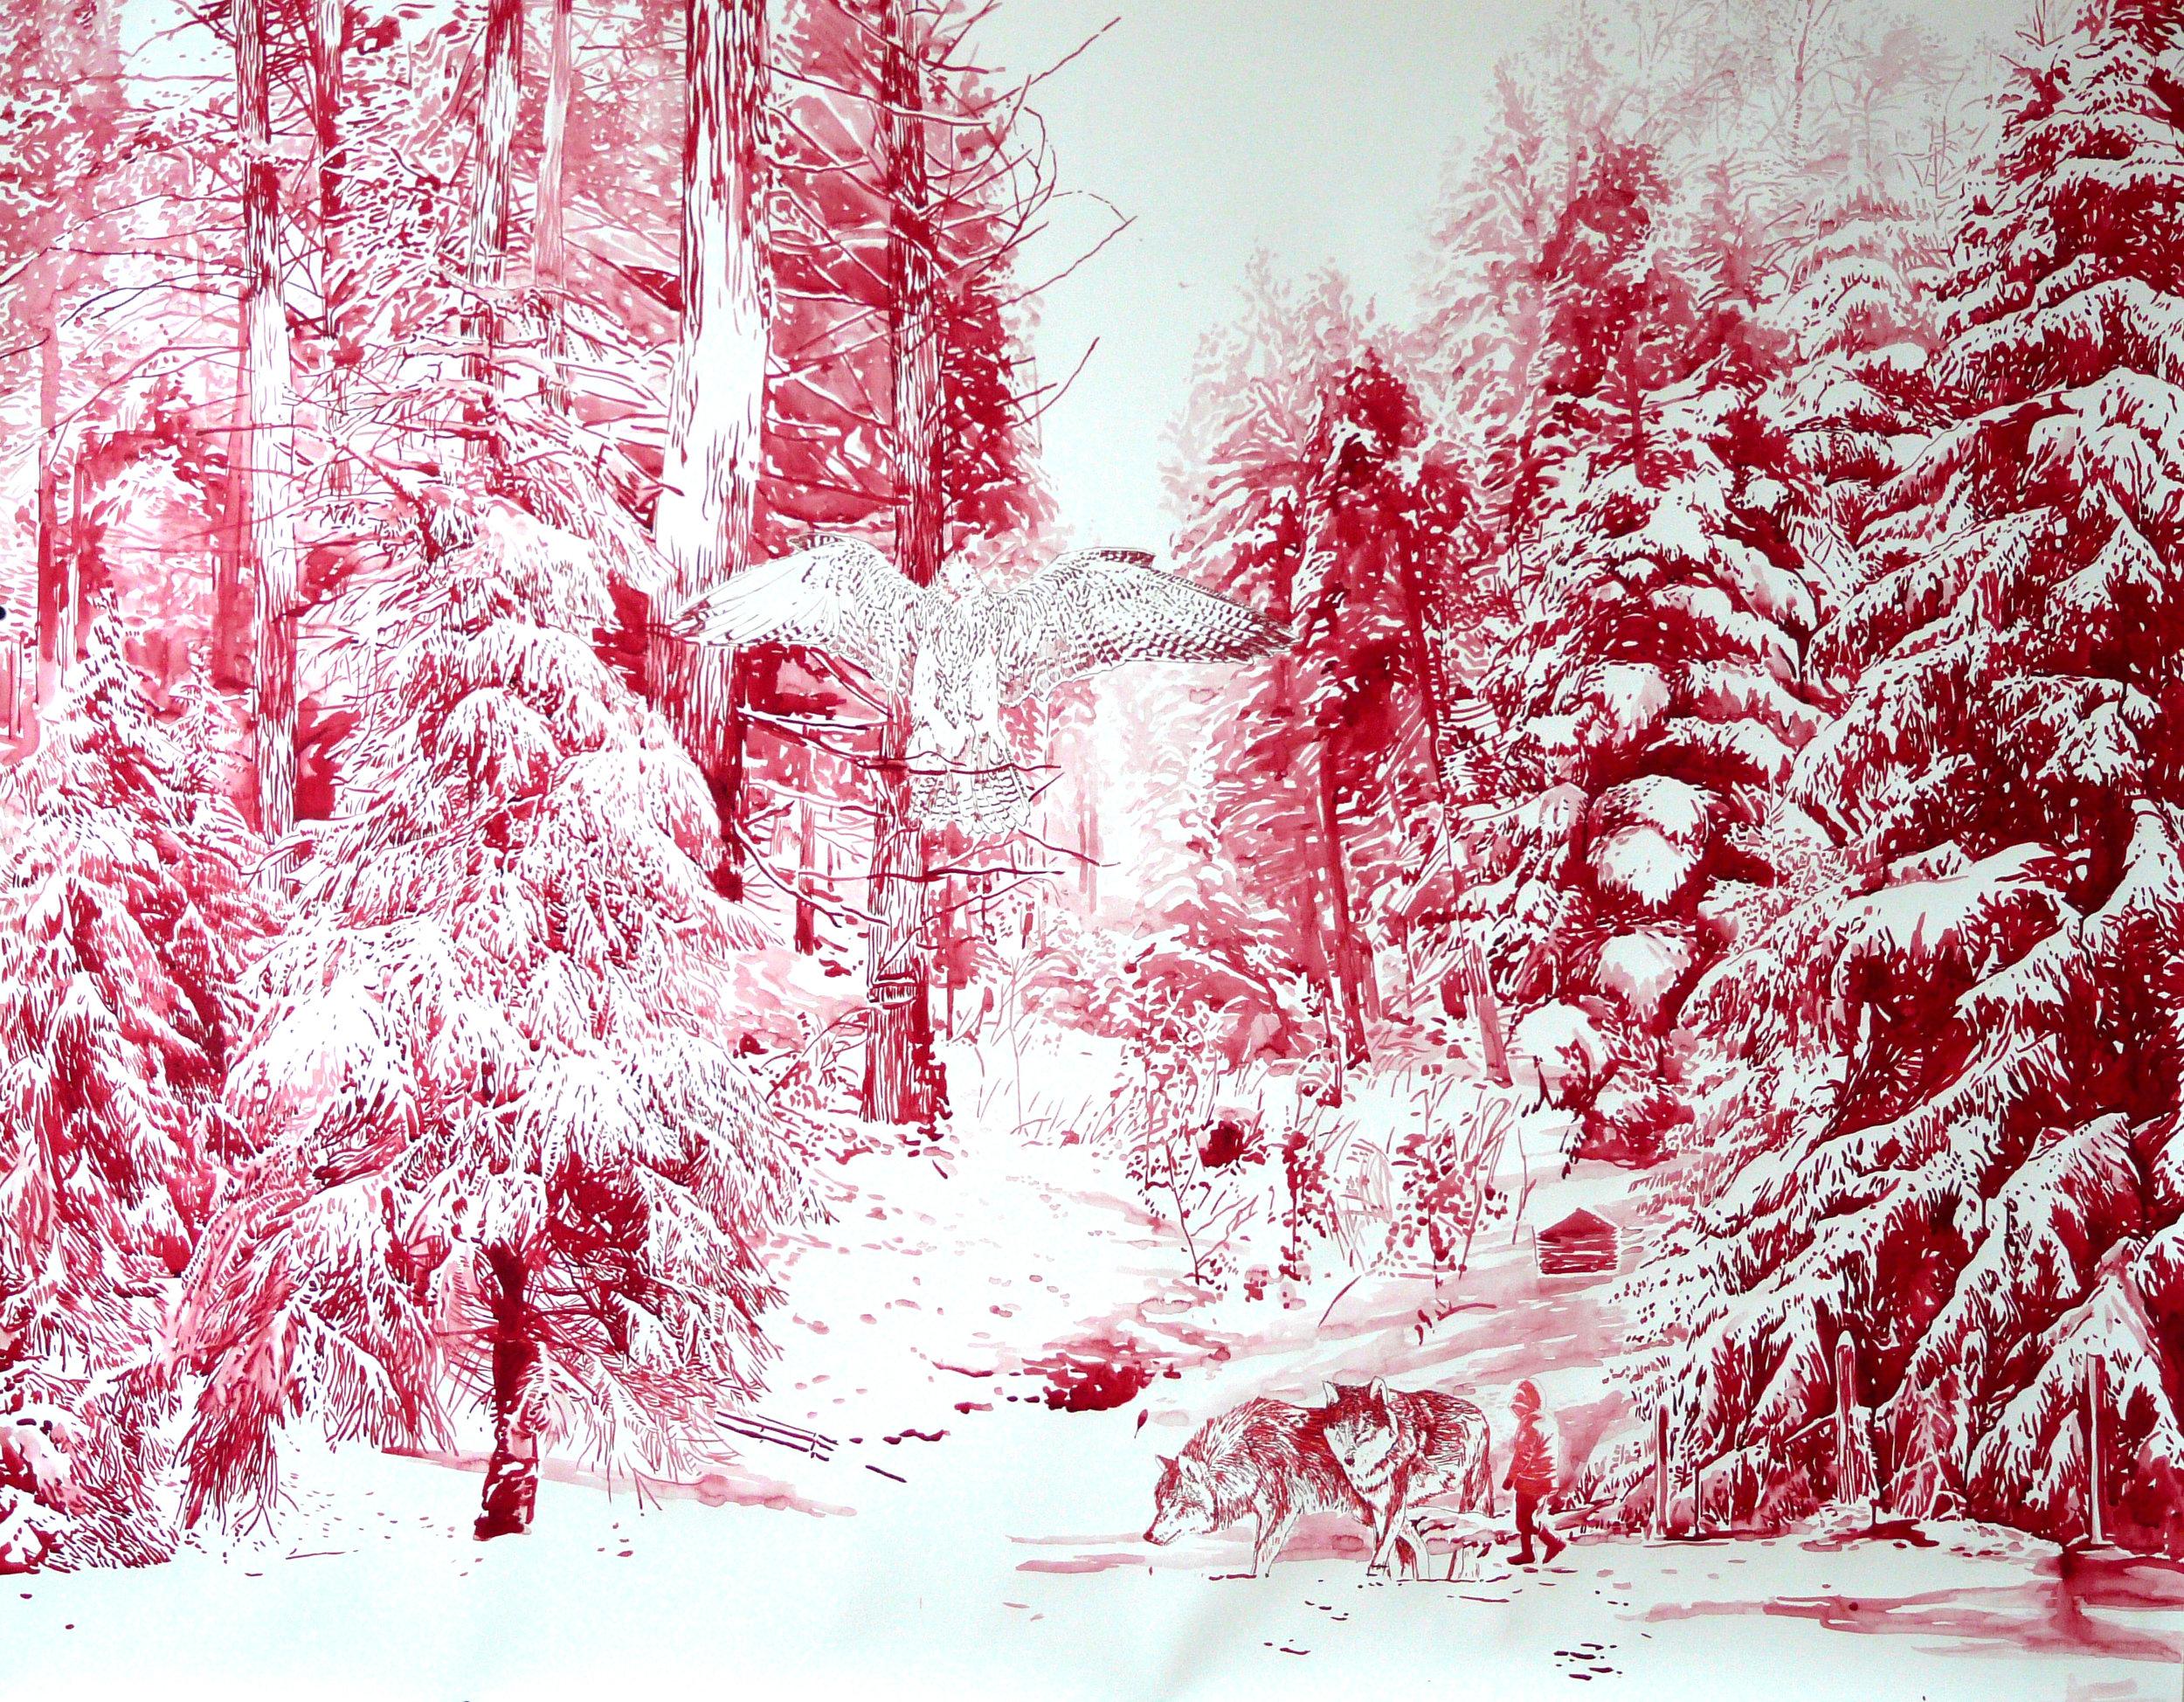 malgosia_jankowska_wald_im_winter_2011.jpg